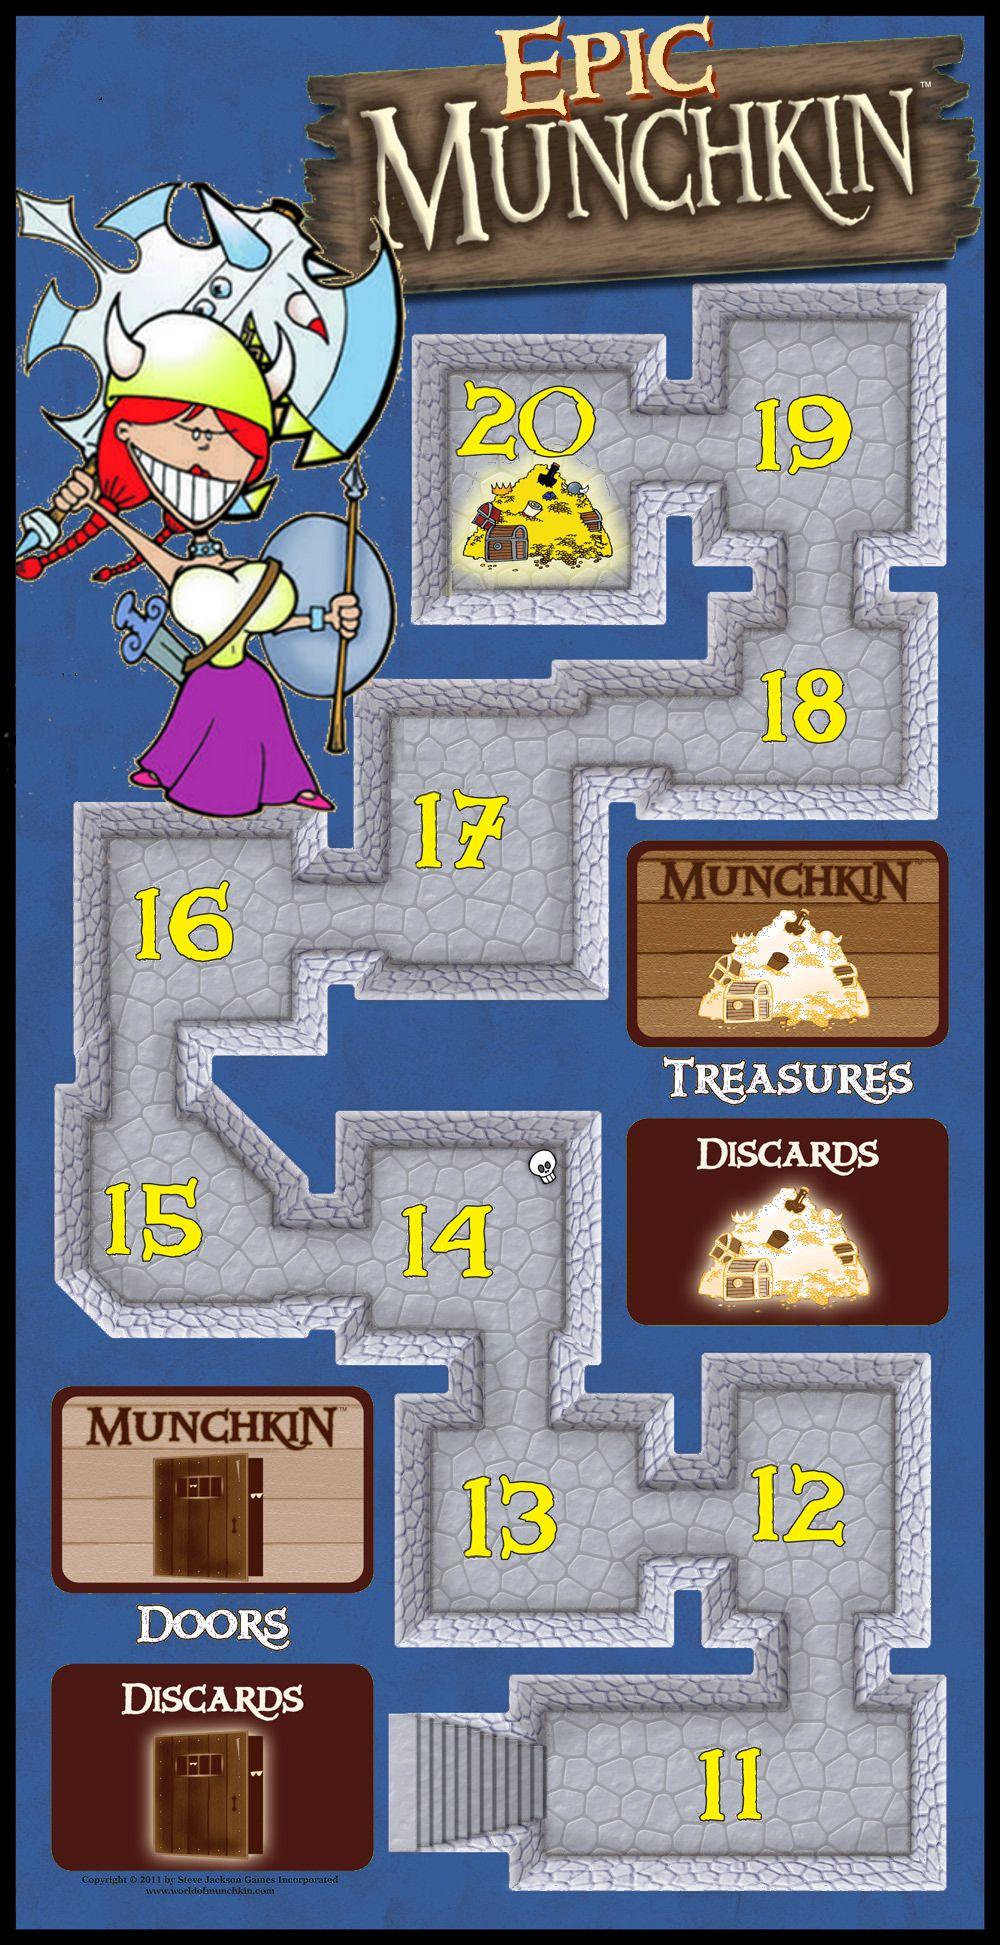 Epic Munchkin Game Board by firedude1994 on deviantART | T.W.E.R.P.S ...